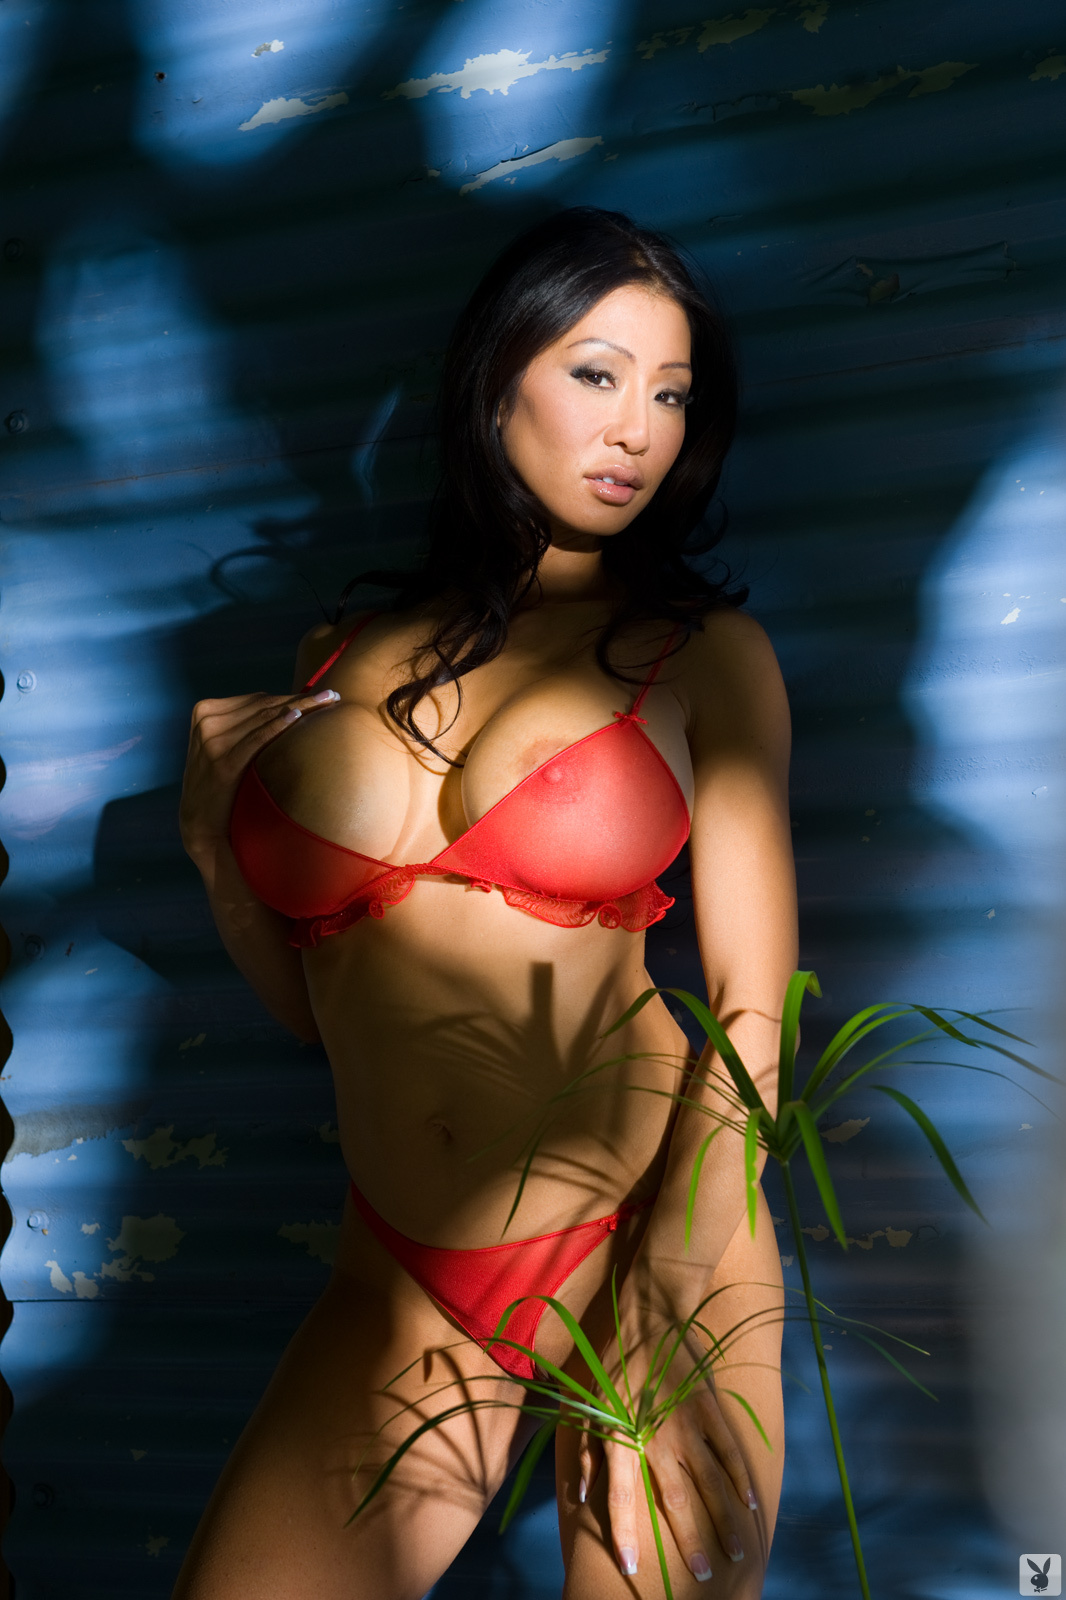 Kiana Kim Nude On Playboy Plus (4)